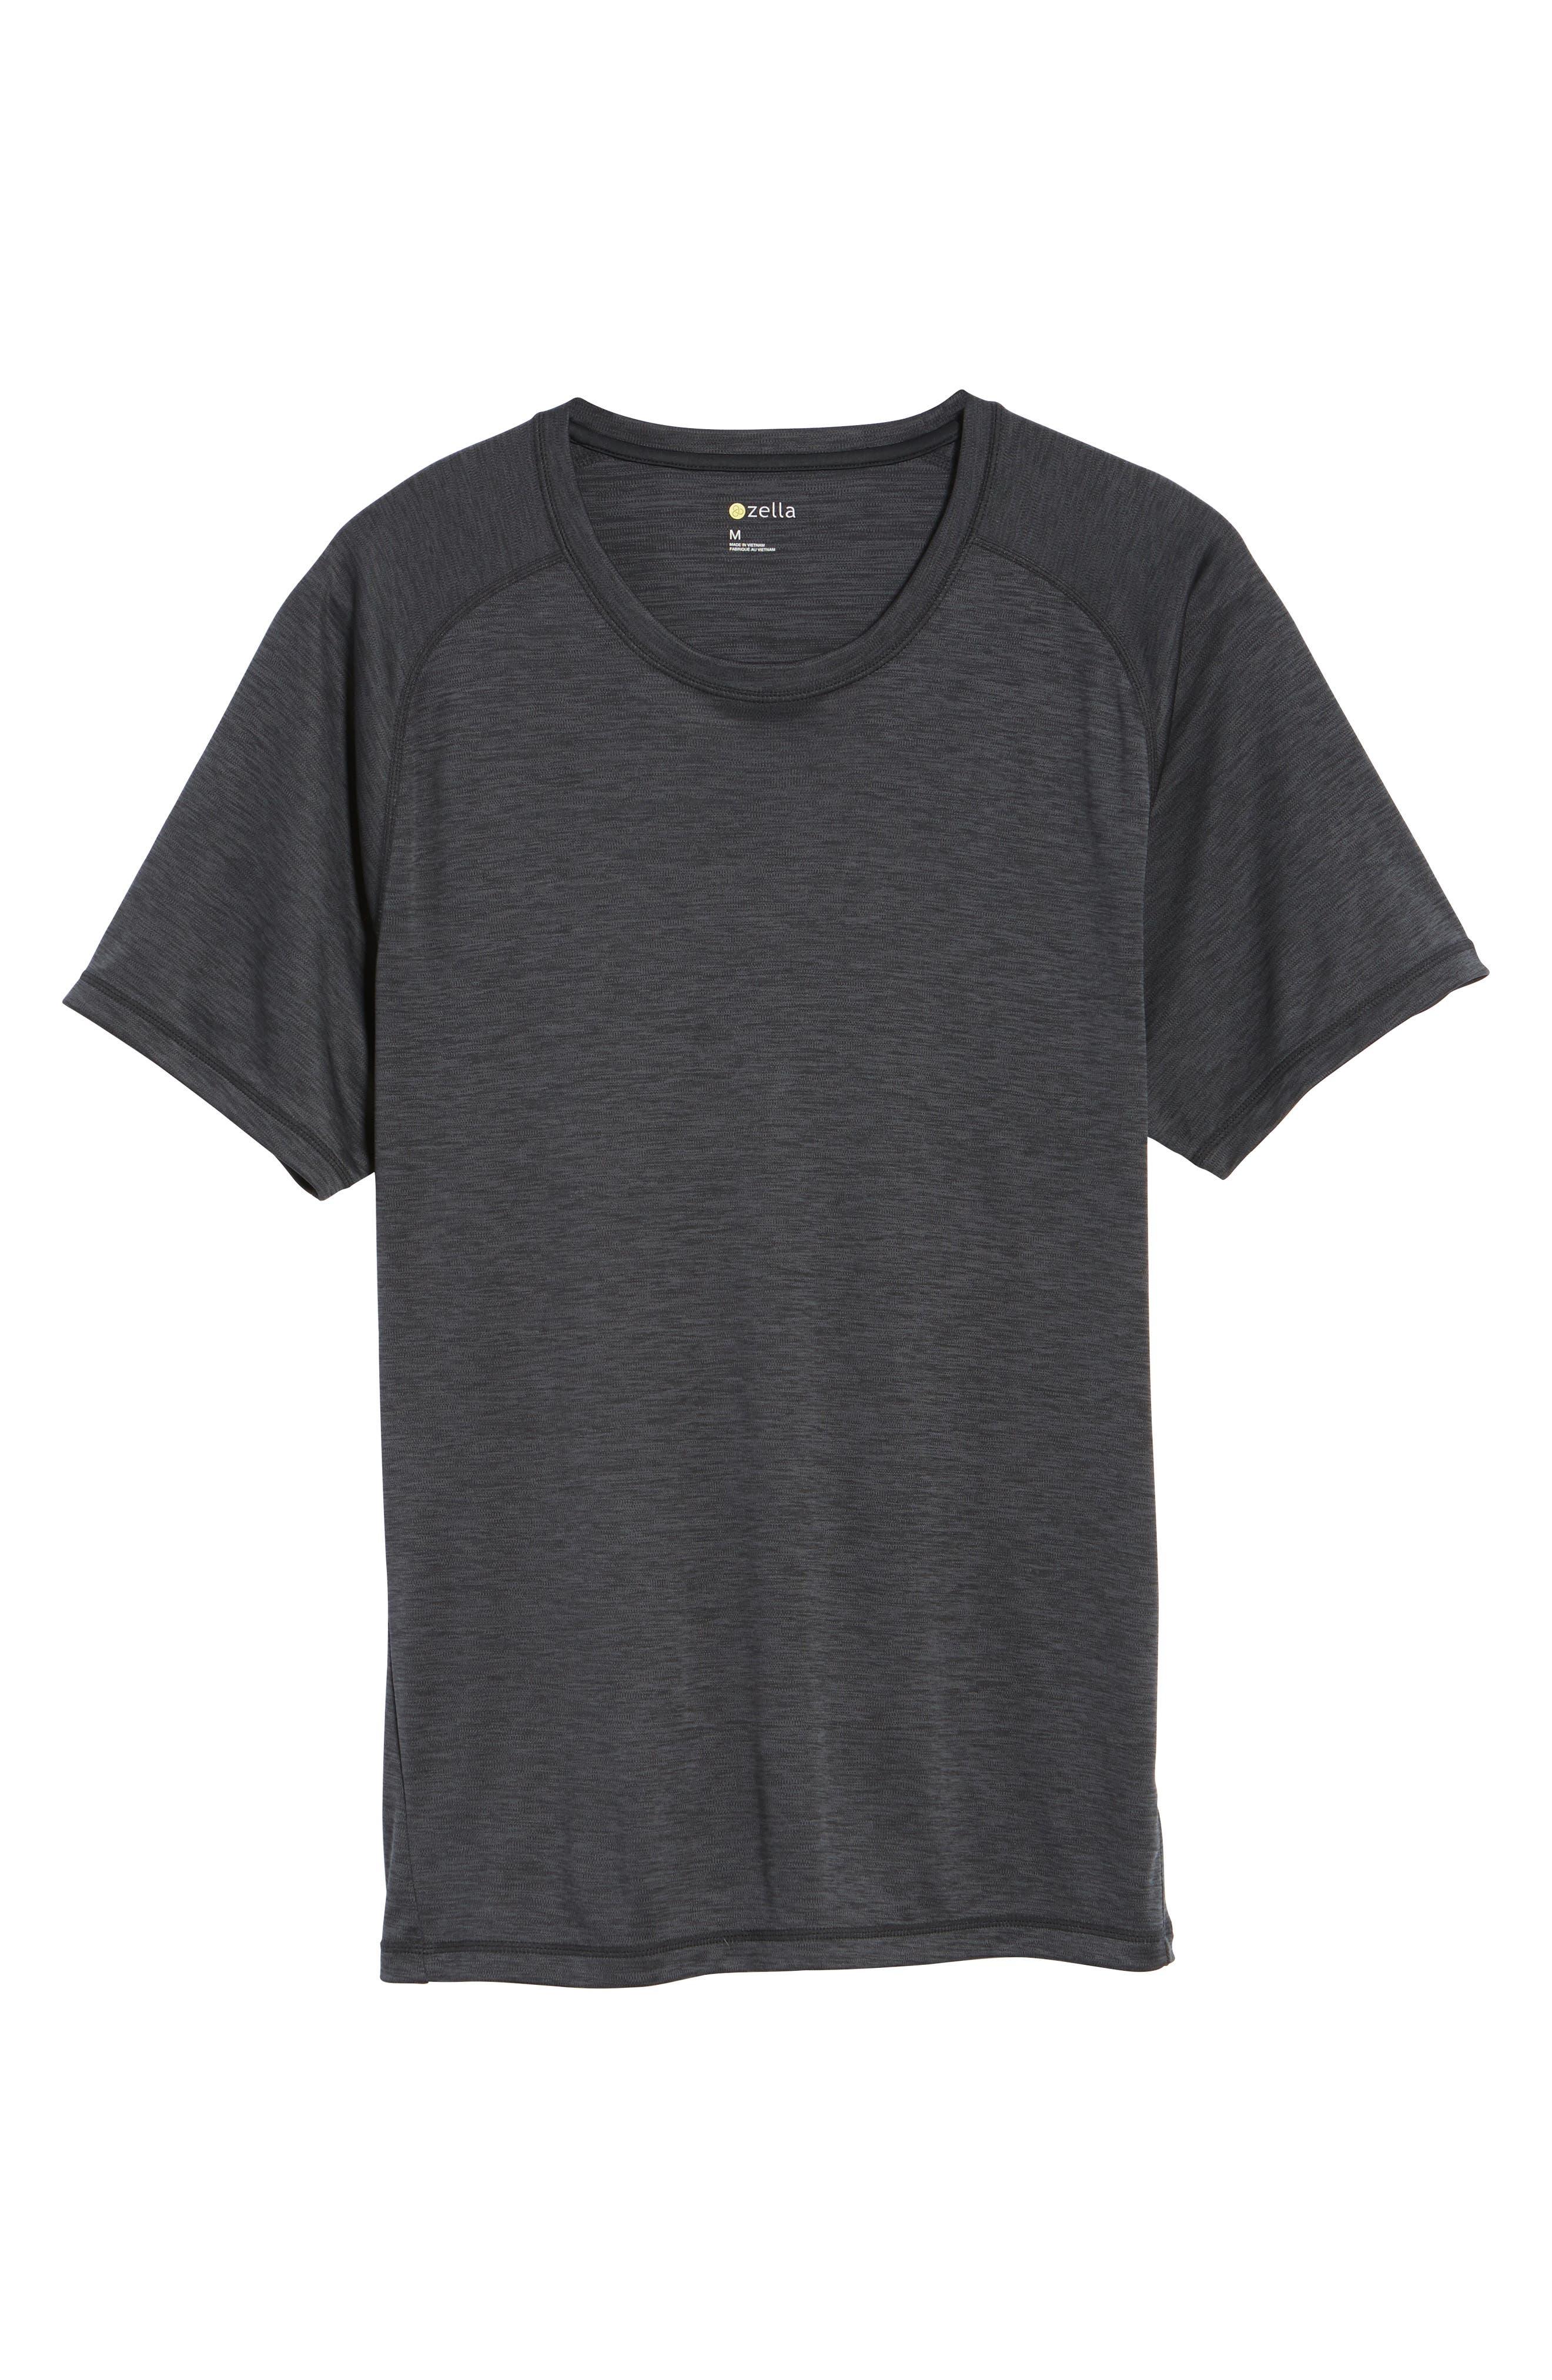 Triplite T-Shirt,                             Alternate thumbnail 70, color,